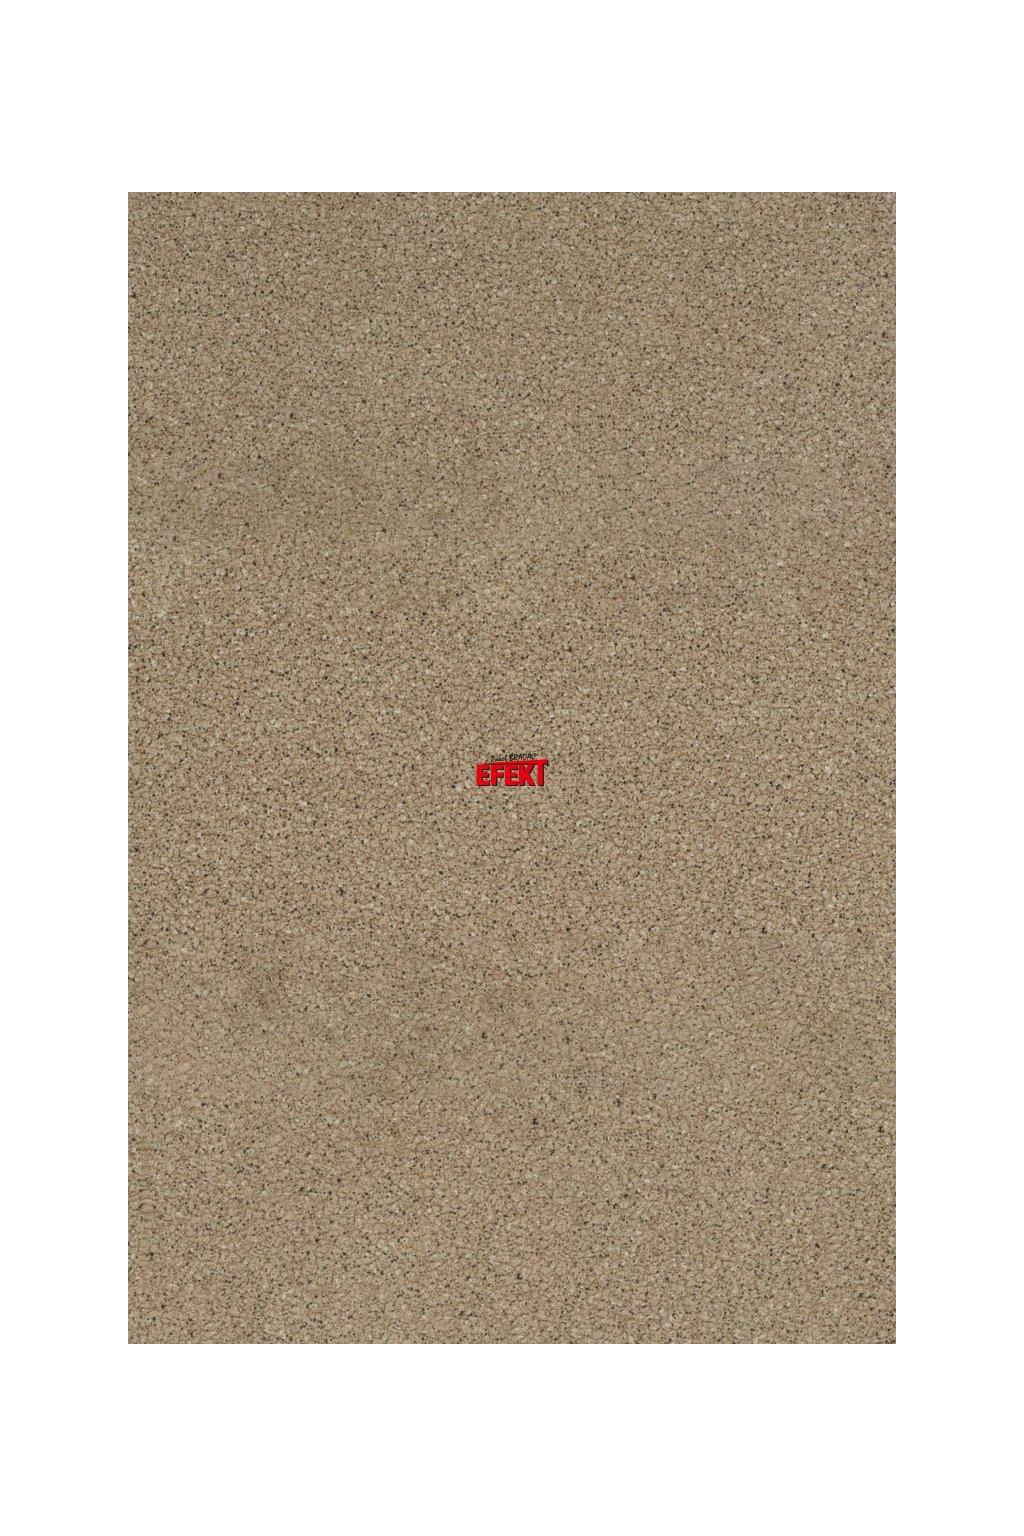 Gerflor Timberline Pixel Earth 2183